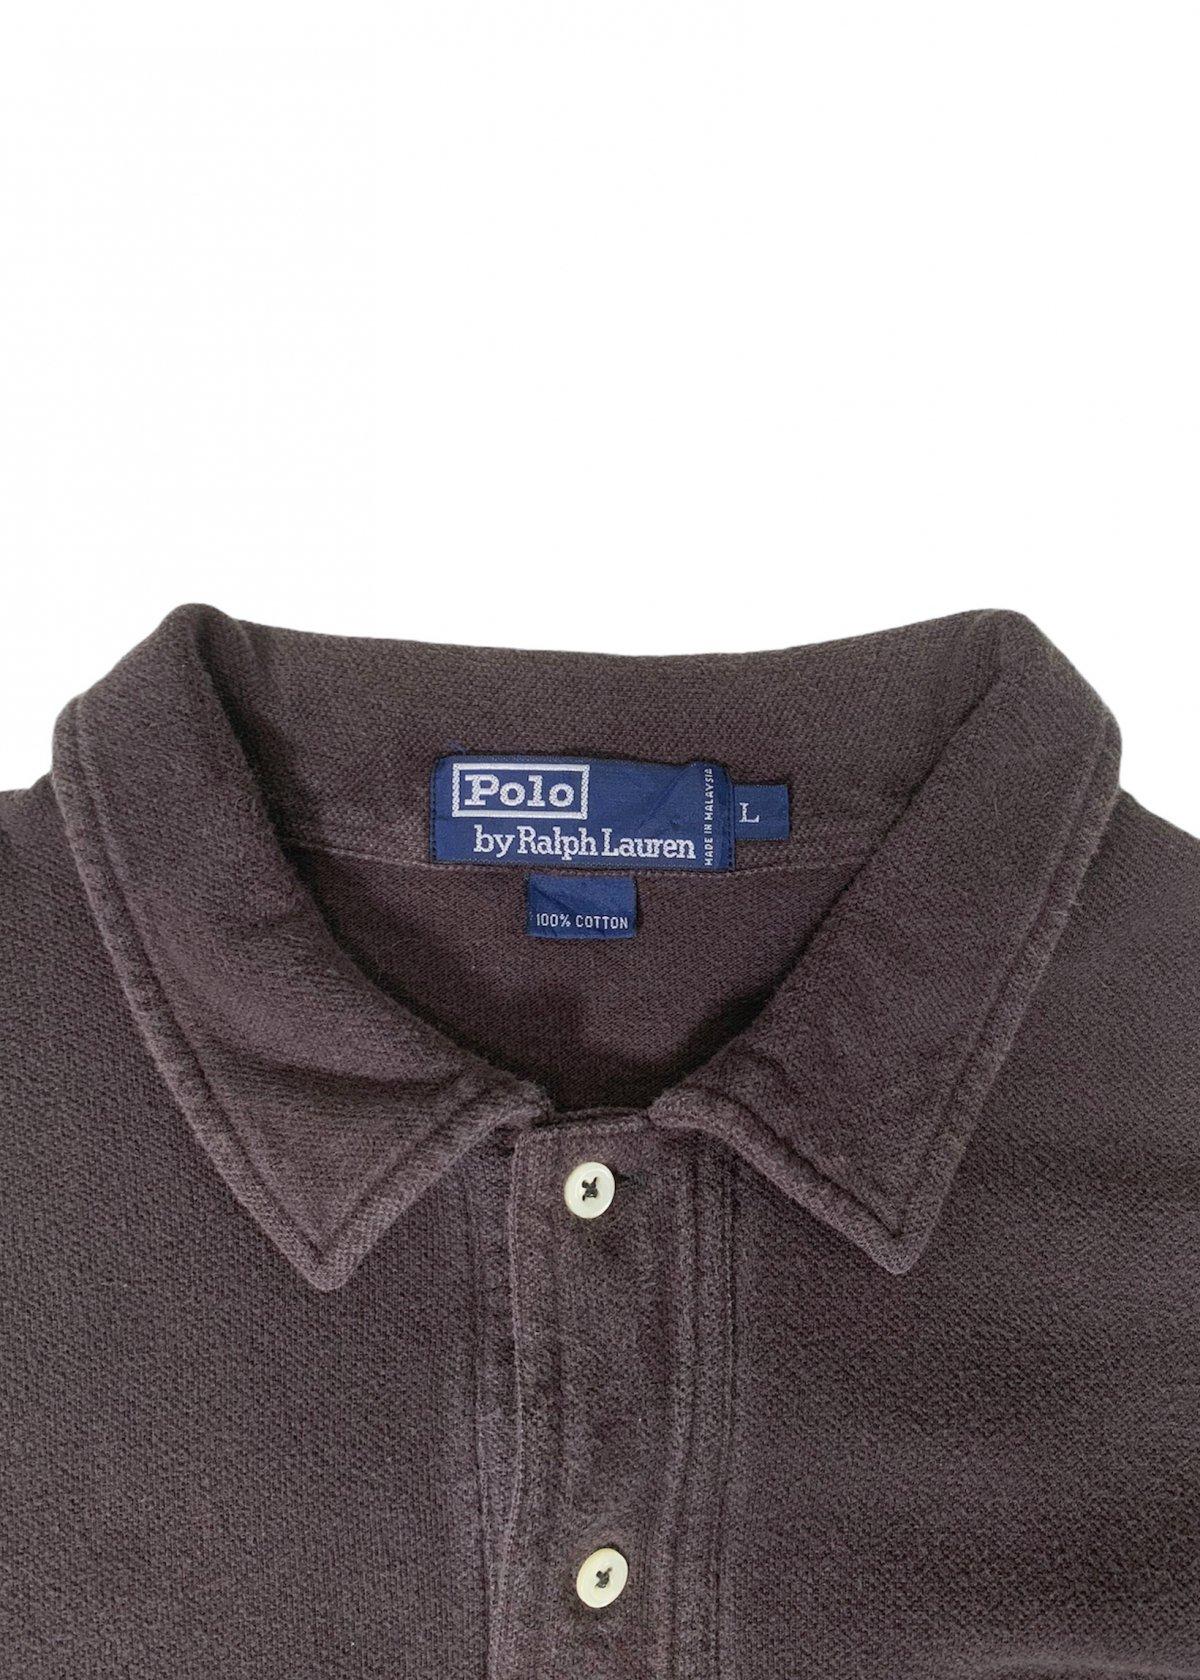 "I&I 古着 通販 ""Polo Ralph Lauren"" L/S Polo Shirt 詳細画像4"